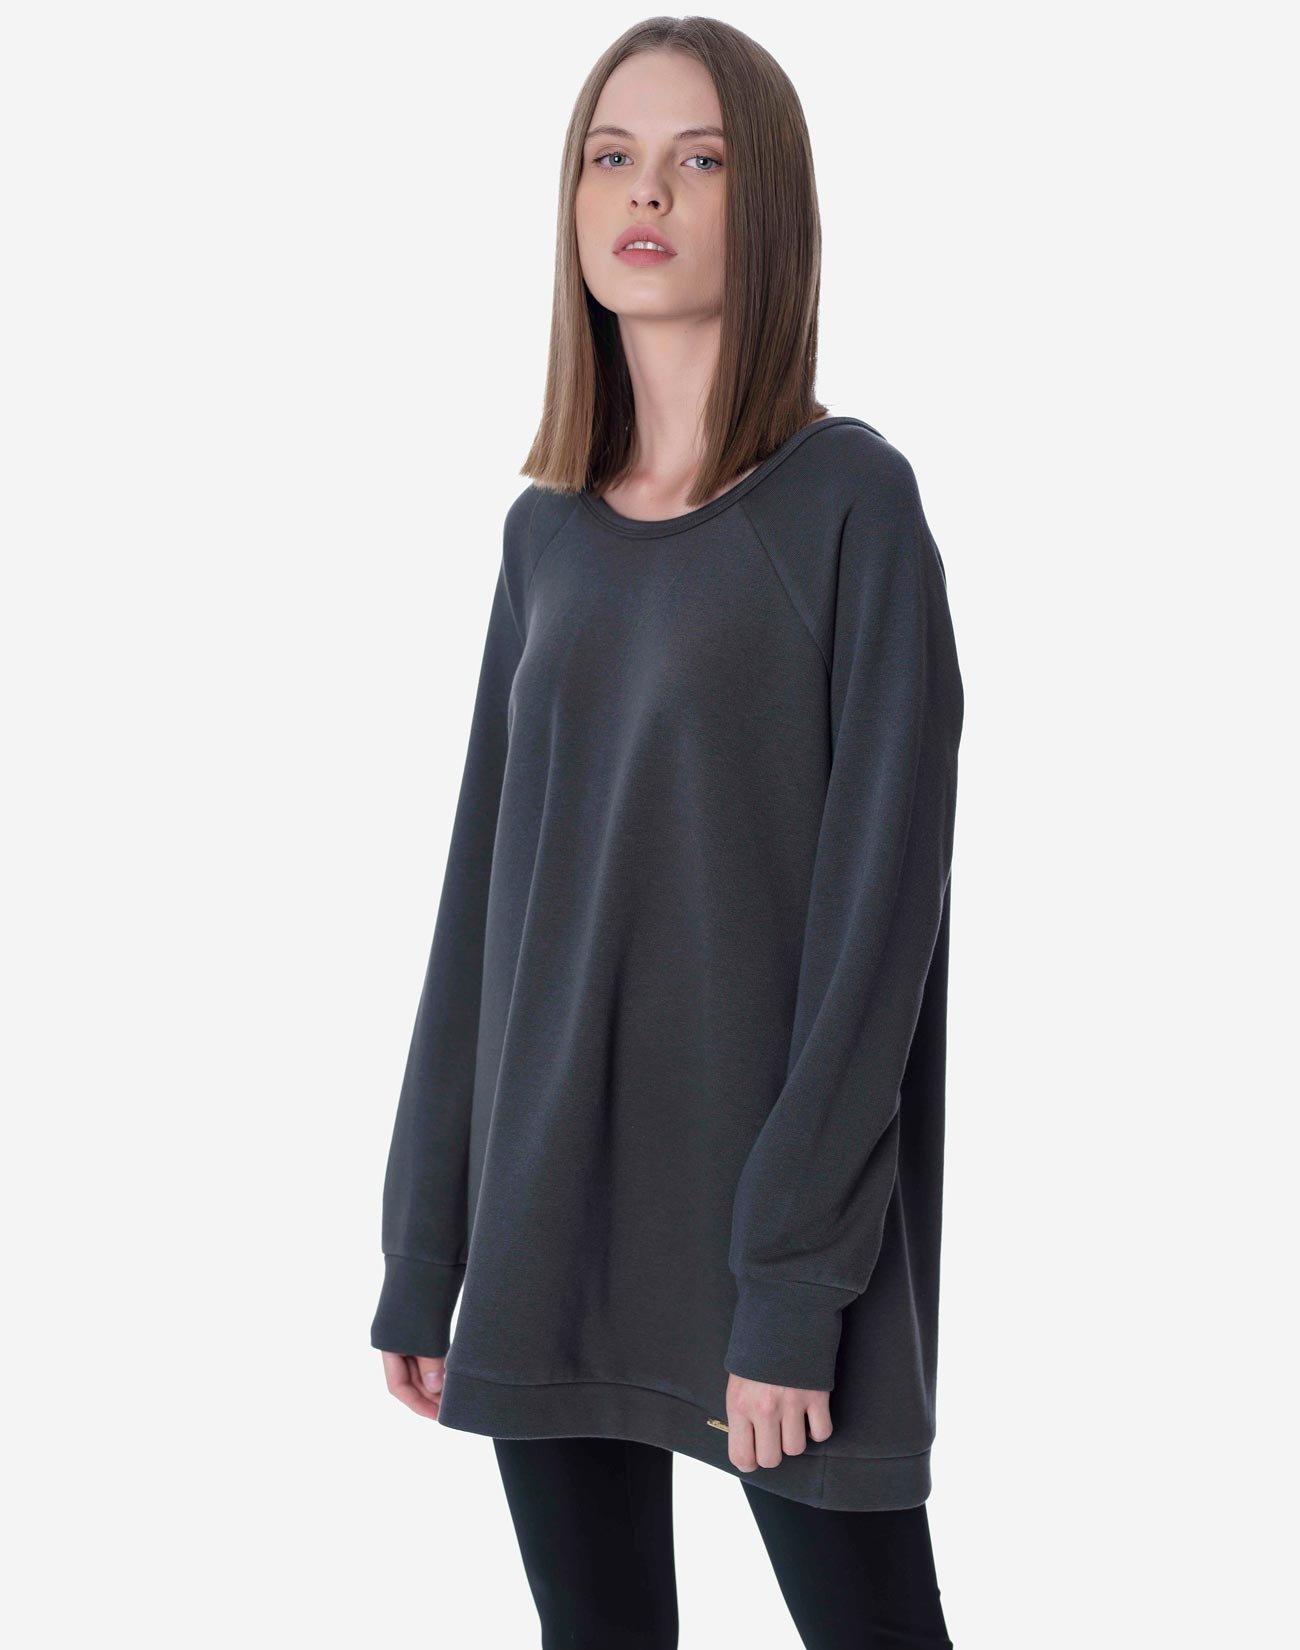 Sweatshirt with bows